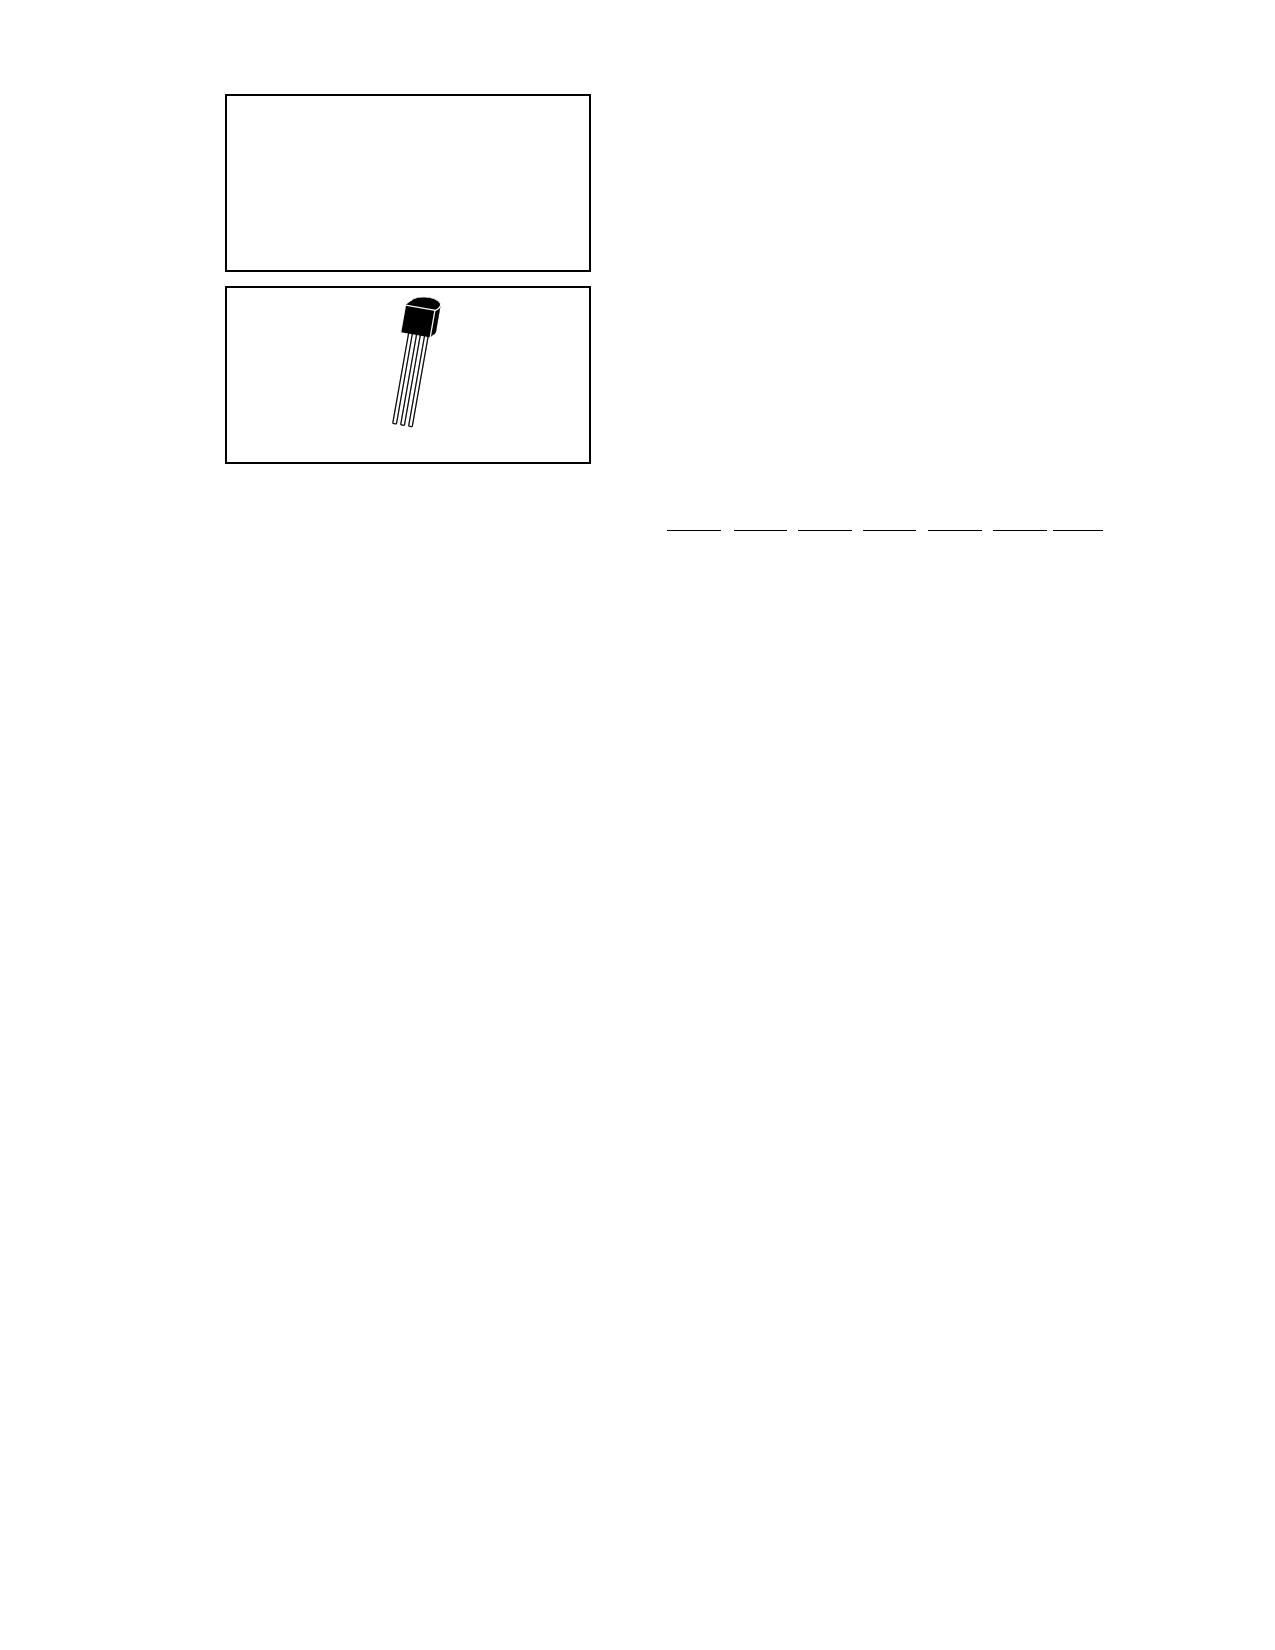 BRX45 Datasheet, BRX45 PDF,ピン配置, 機能